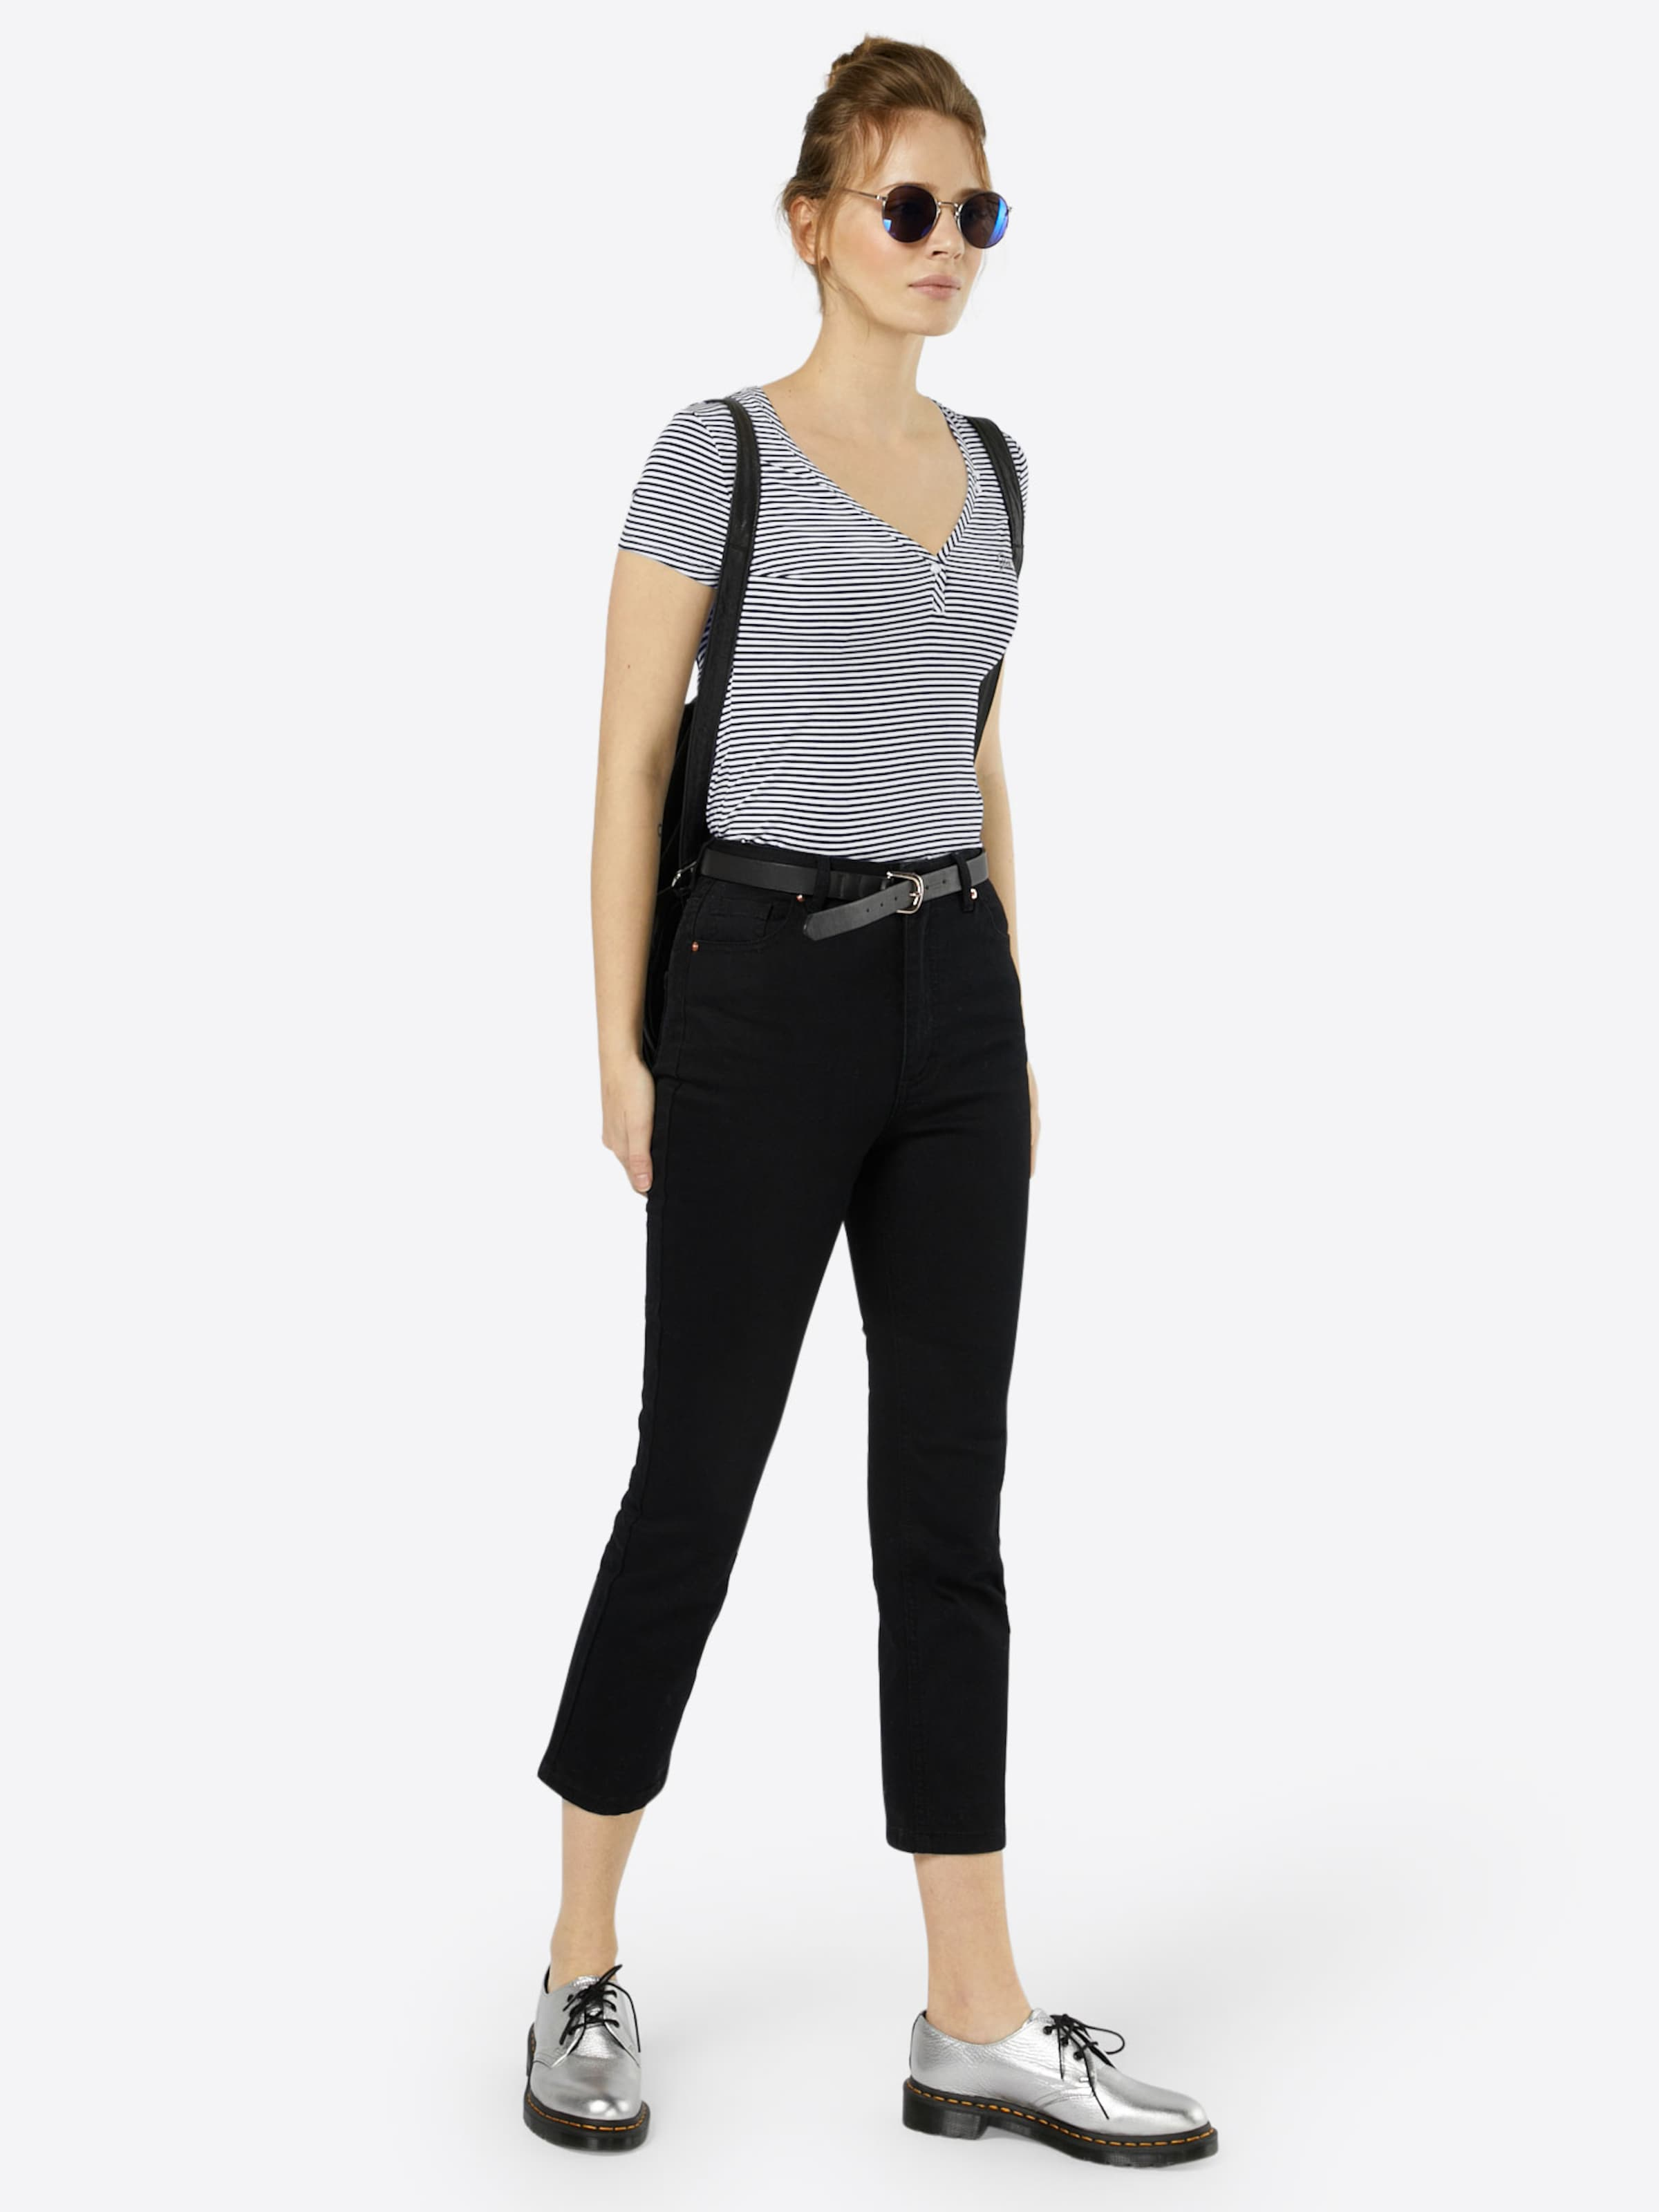 GUESS Shirt 'SERAFINO' Offizielle Seite Günstiger Preis Webseite Günstiger Preis Frei Für Verkauf jFy5riRtzh